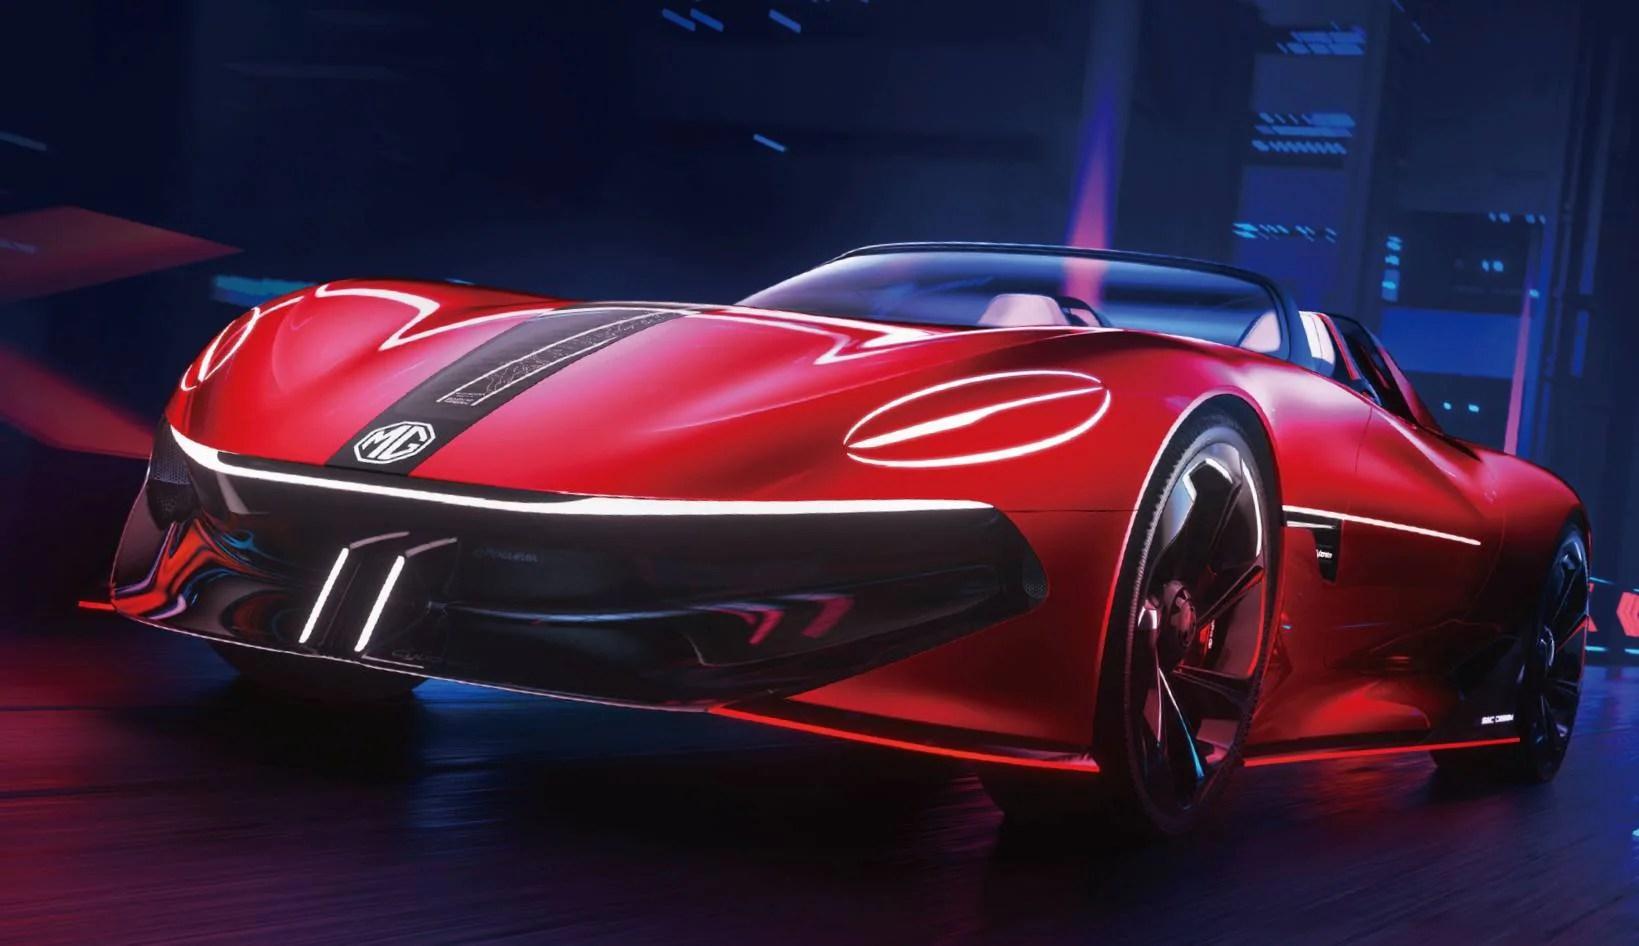 MG Cyberster concept previews 5G-ready electric sportscar with 800-kilometre range- Technology News, Gadgetclock